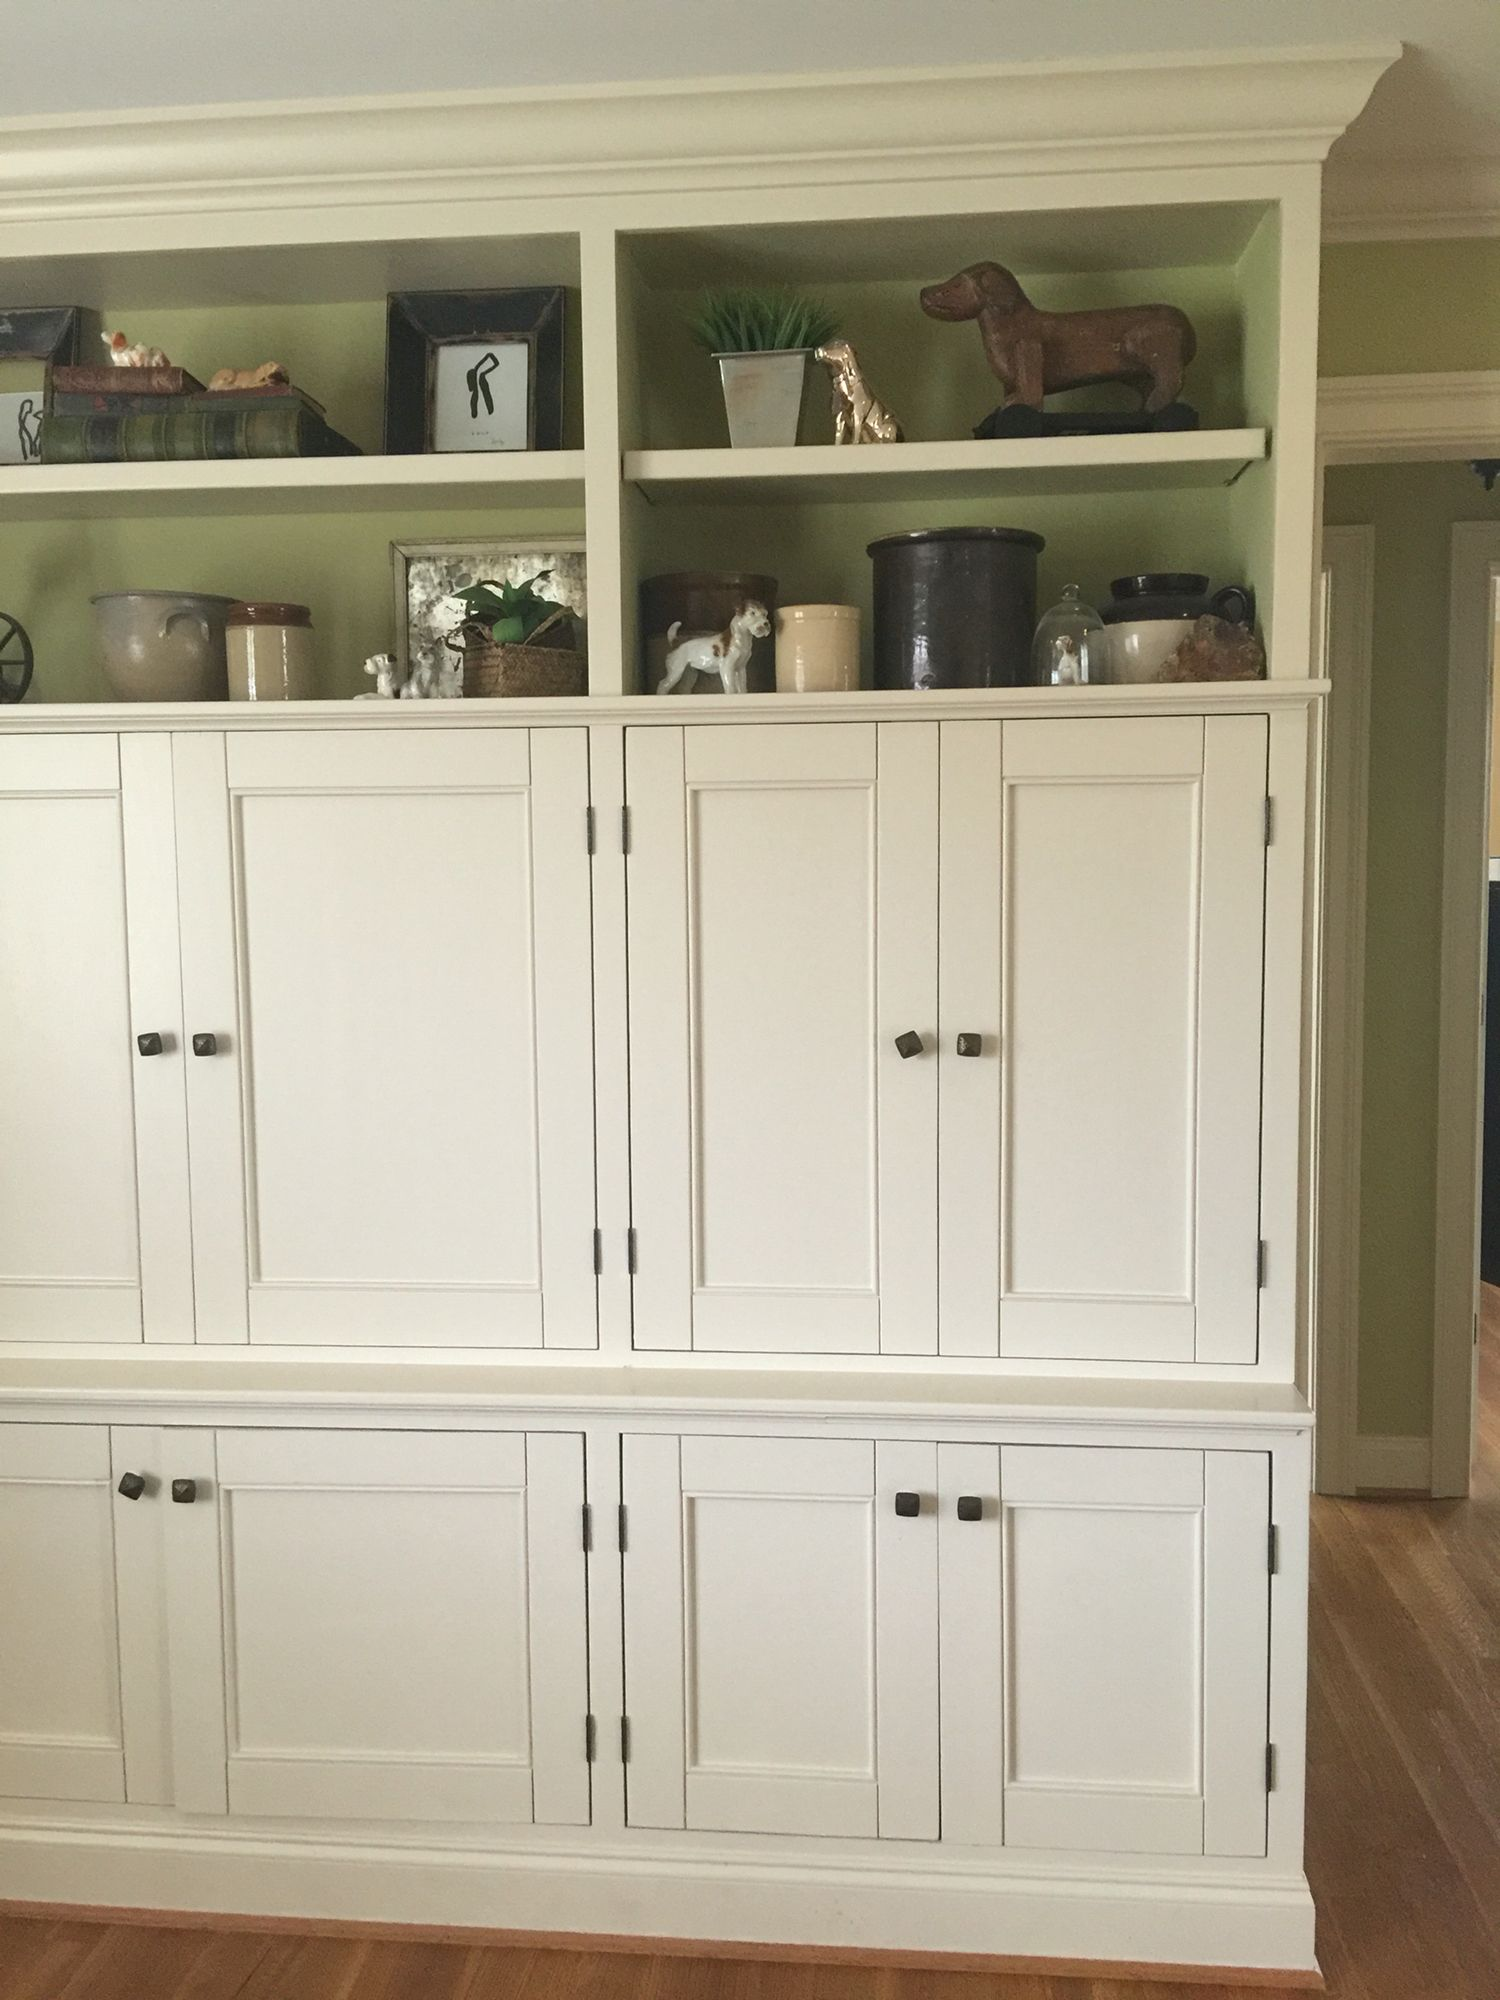 Flush Mount Cabinet Doors Tall Cabinet Storage Cabinet Doors Cabinet